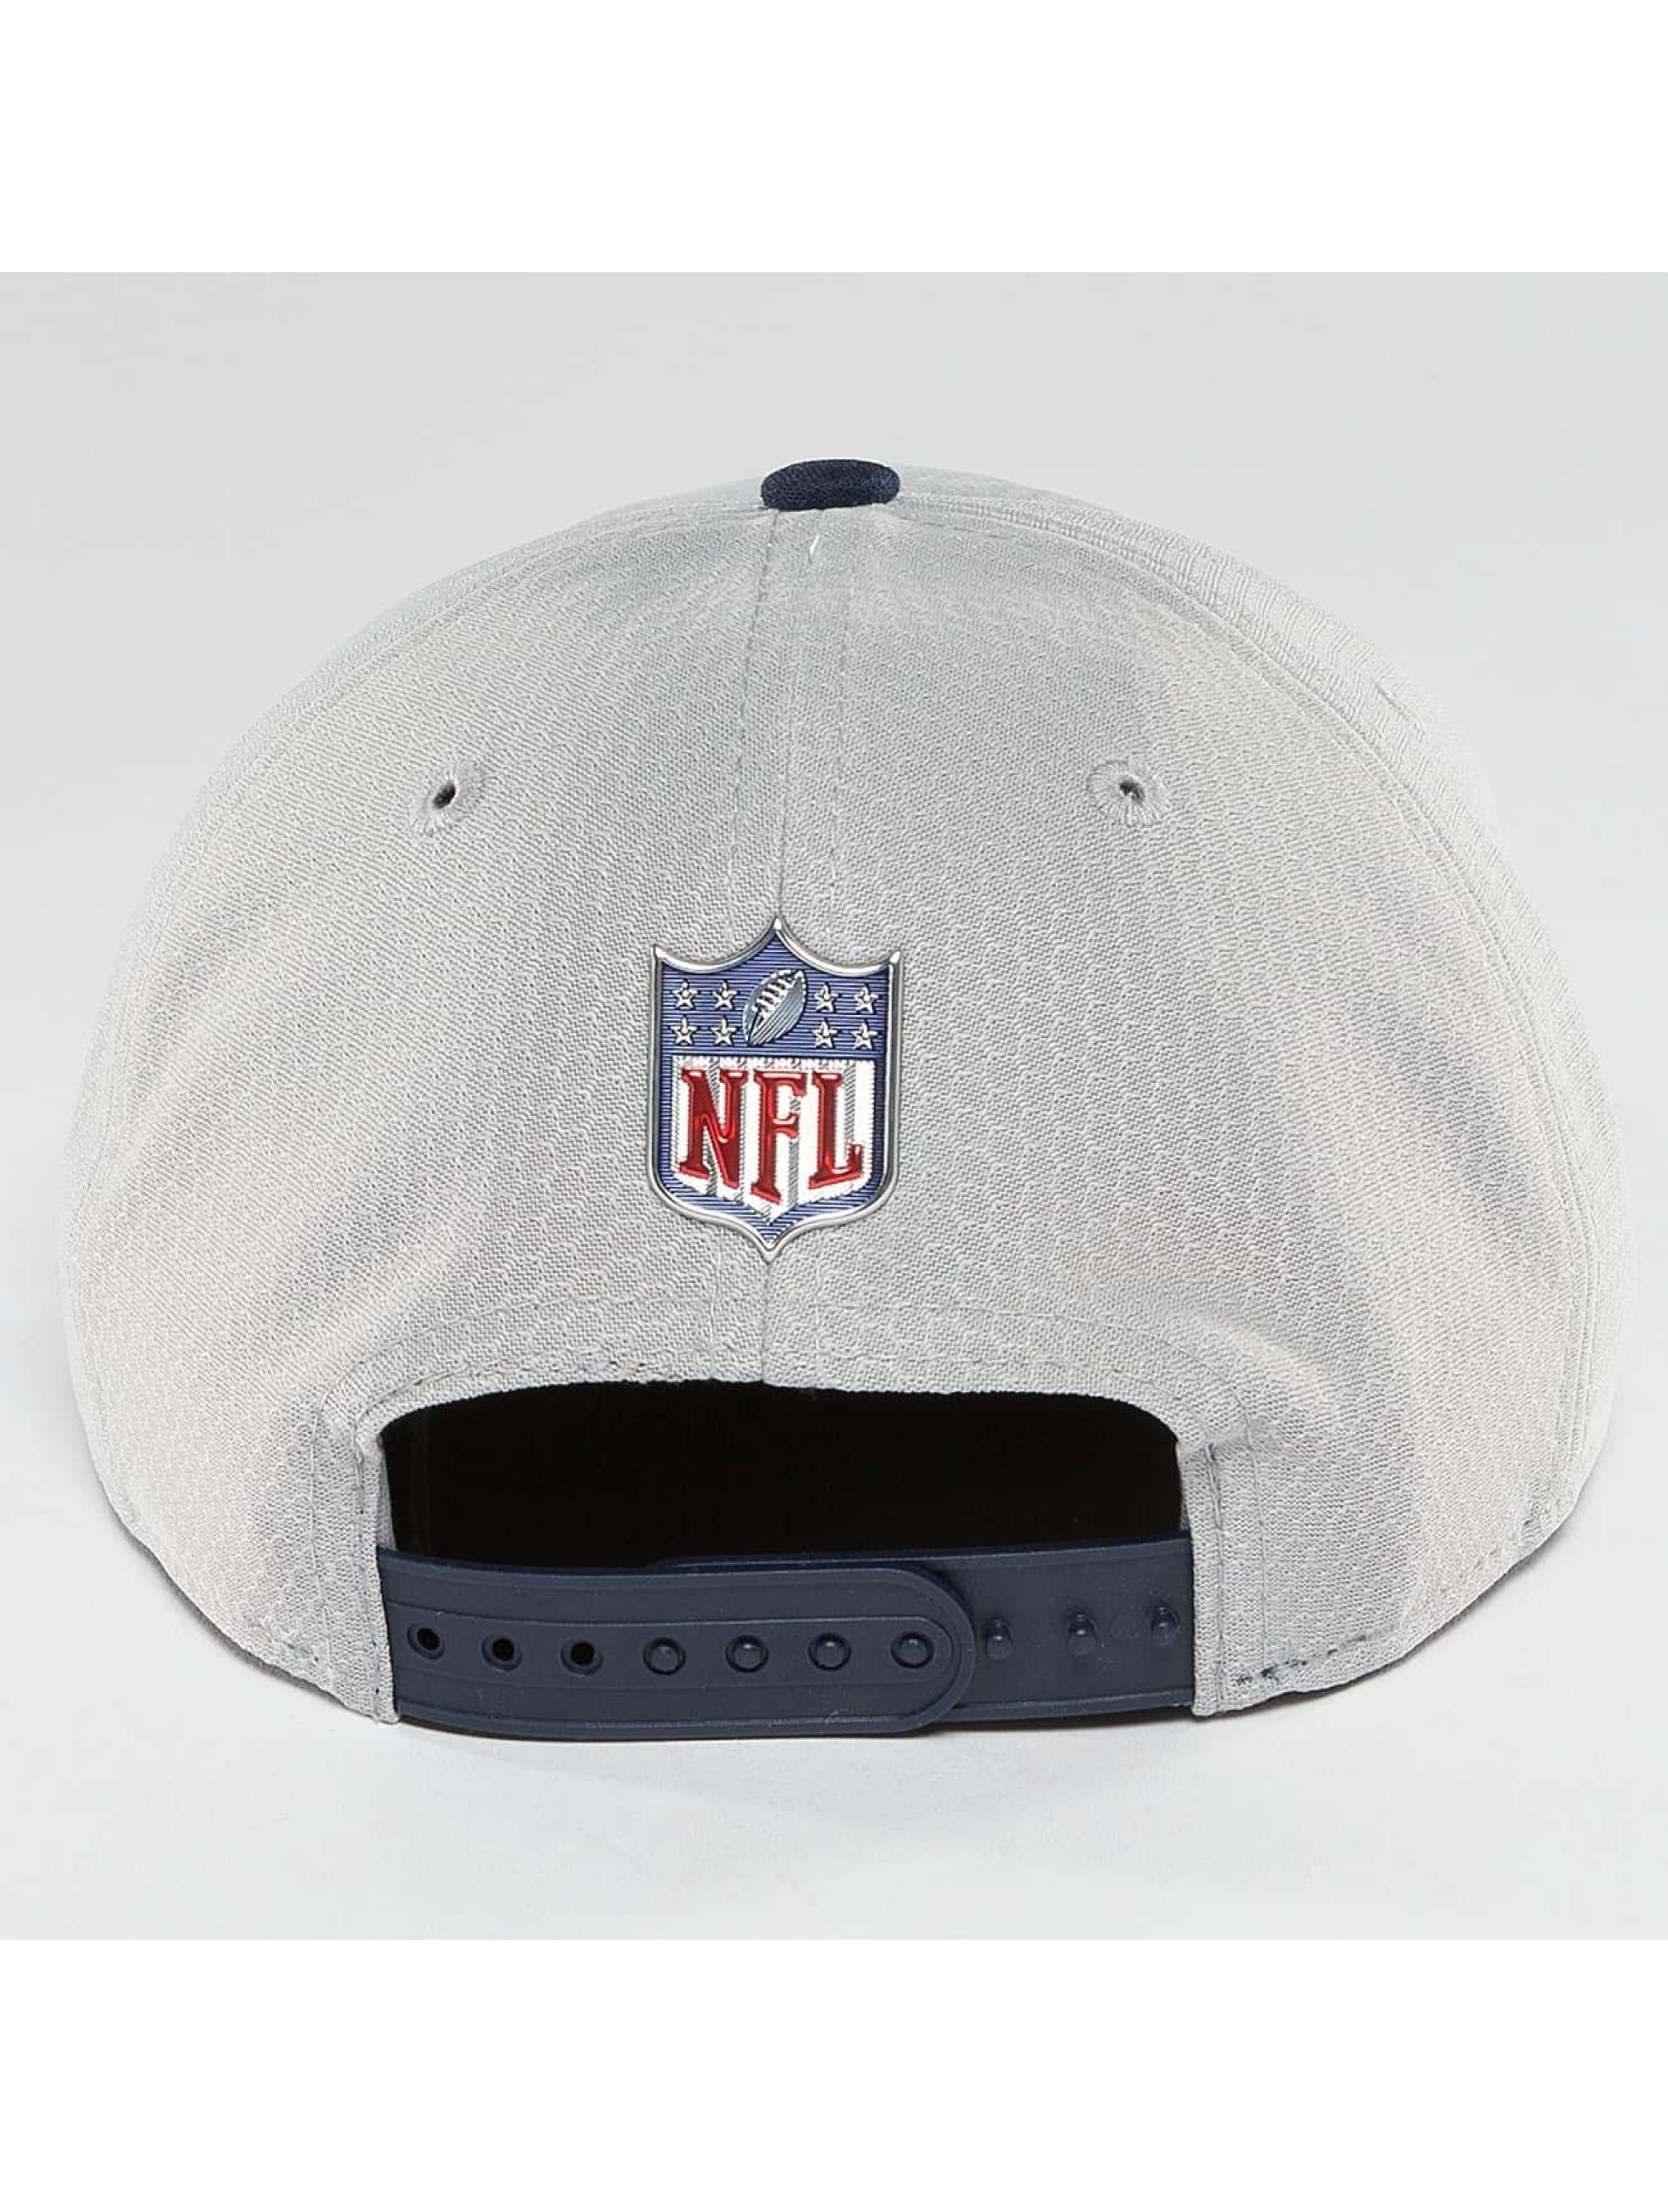 New Era Snapback Cap NFL On Field New England Patriots gray